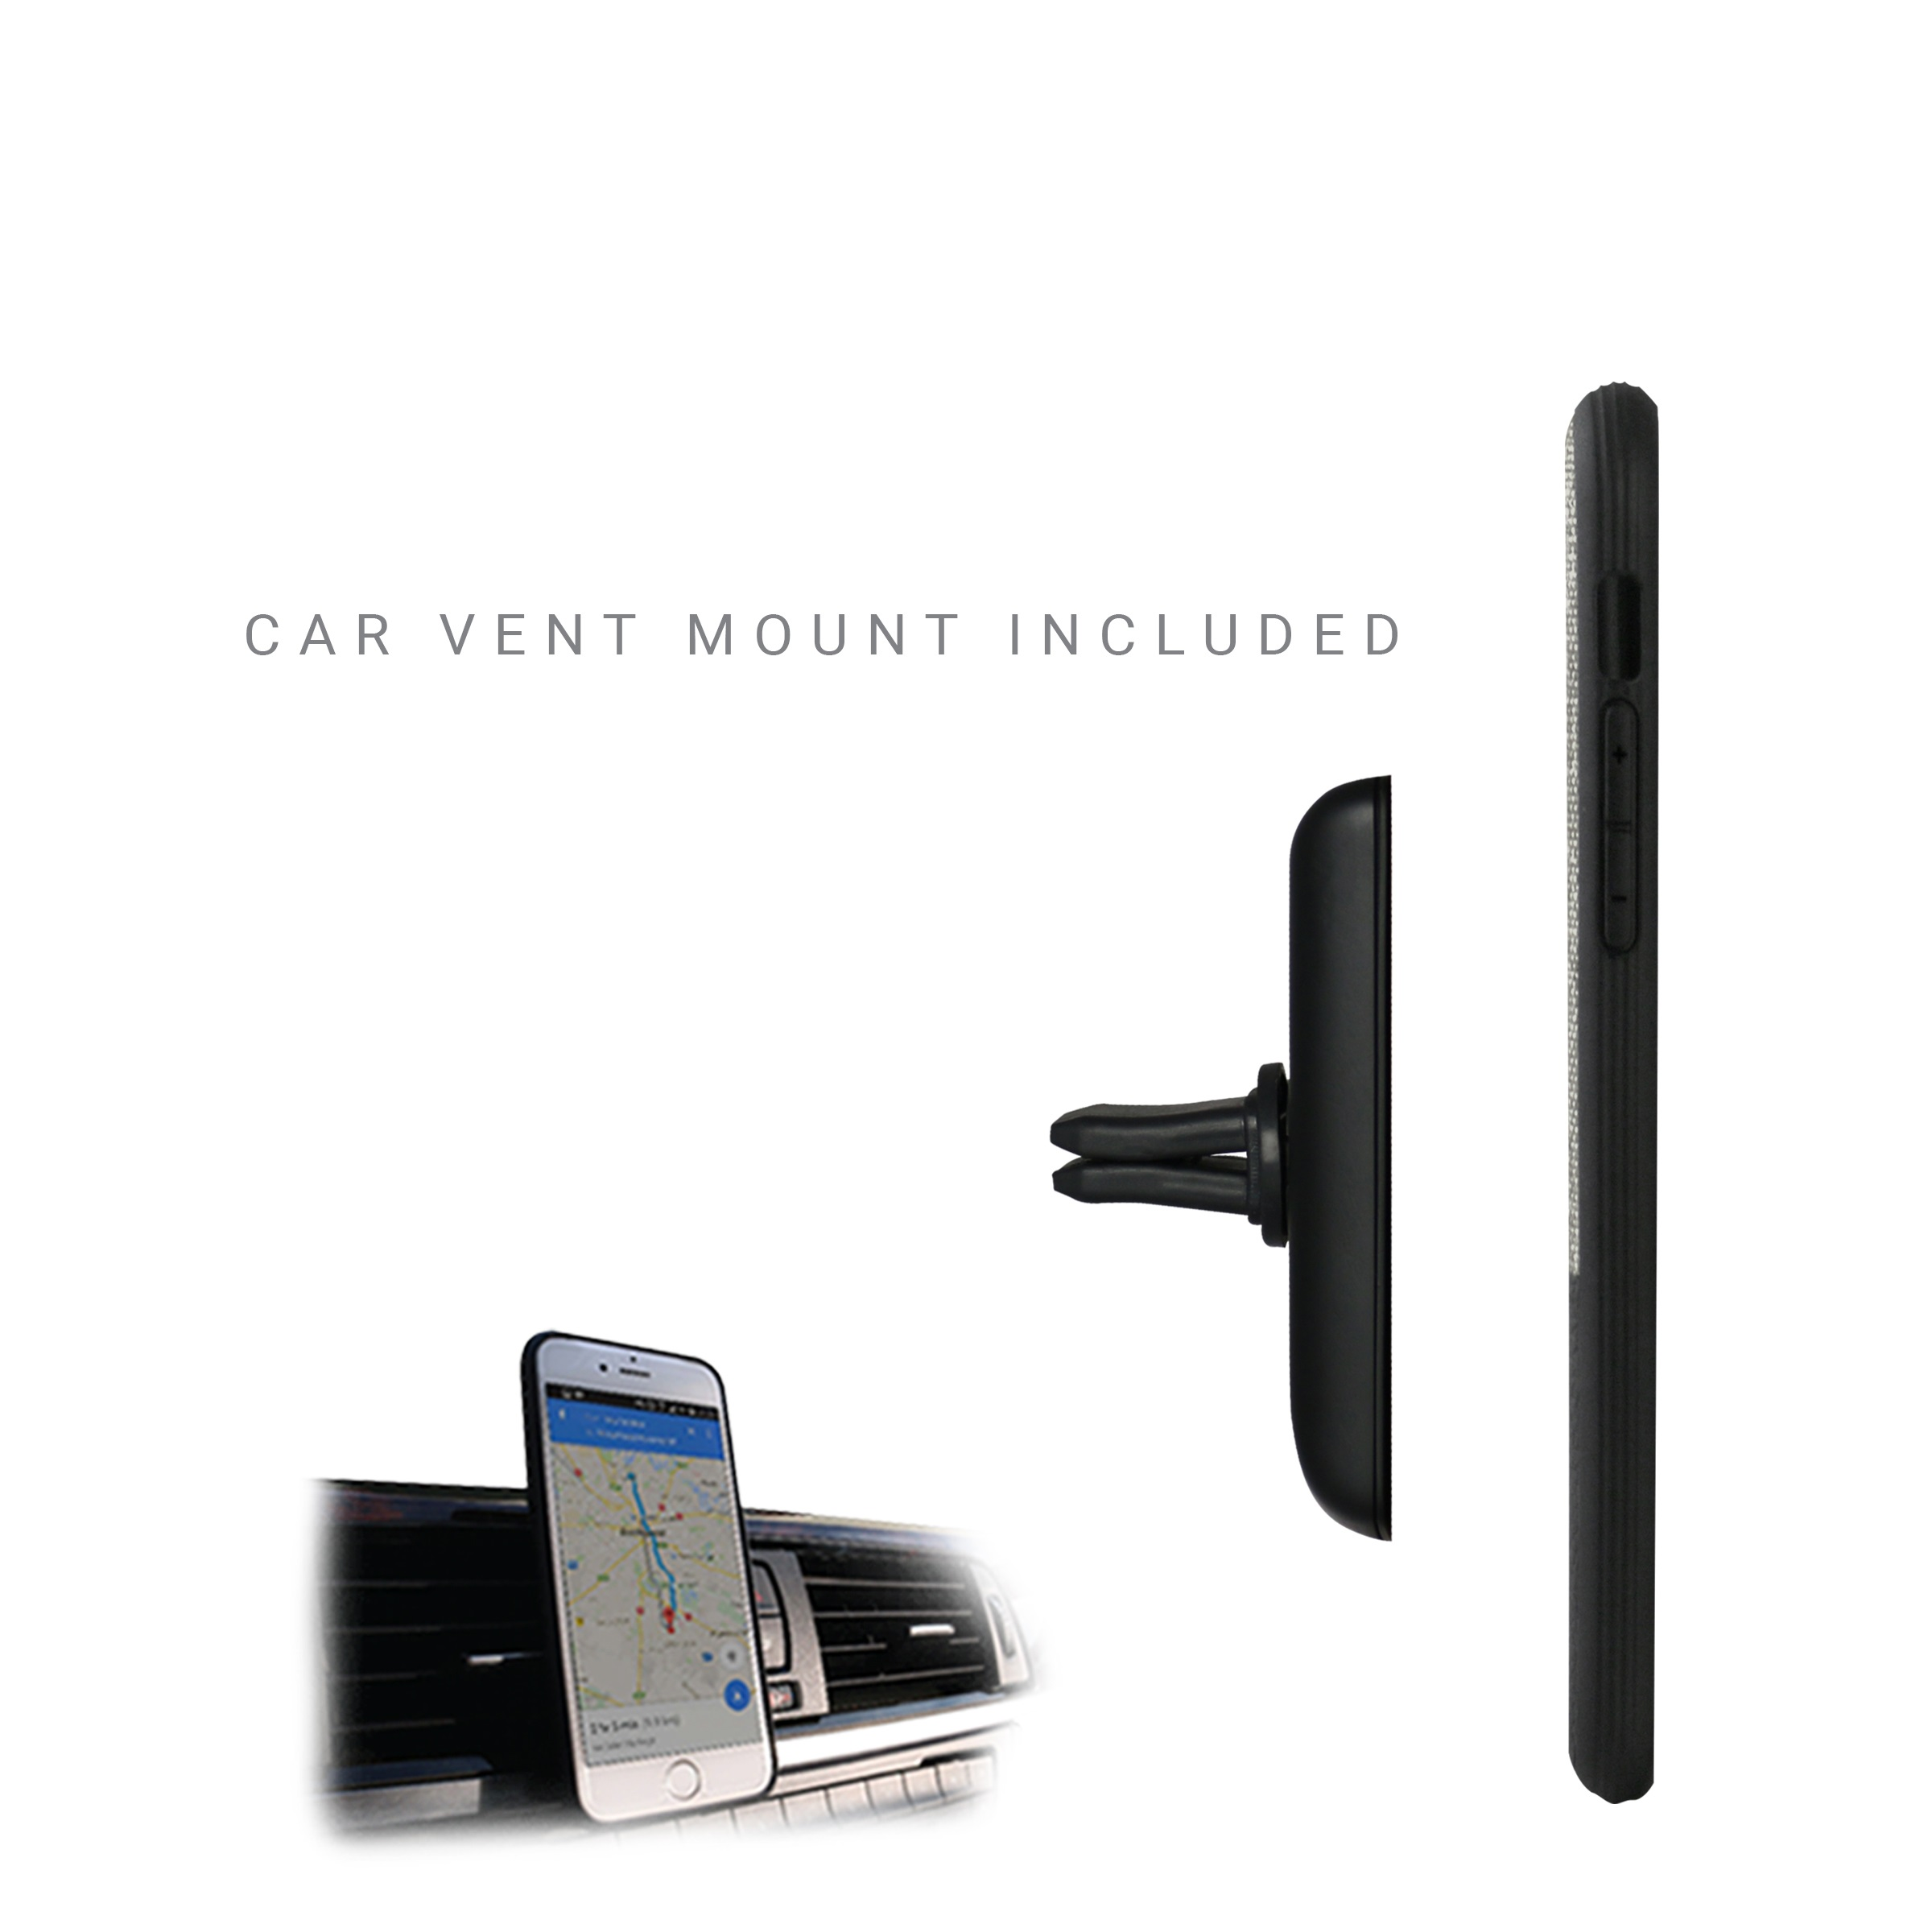 [US Direct] Evutec Case iPhone 11 case Northill, Canvas/Black with AFIX (with car vent mount) Canvas/Black